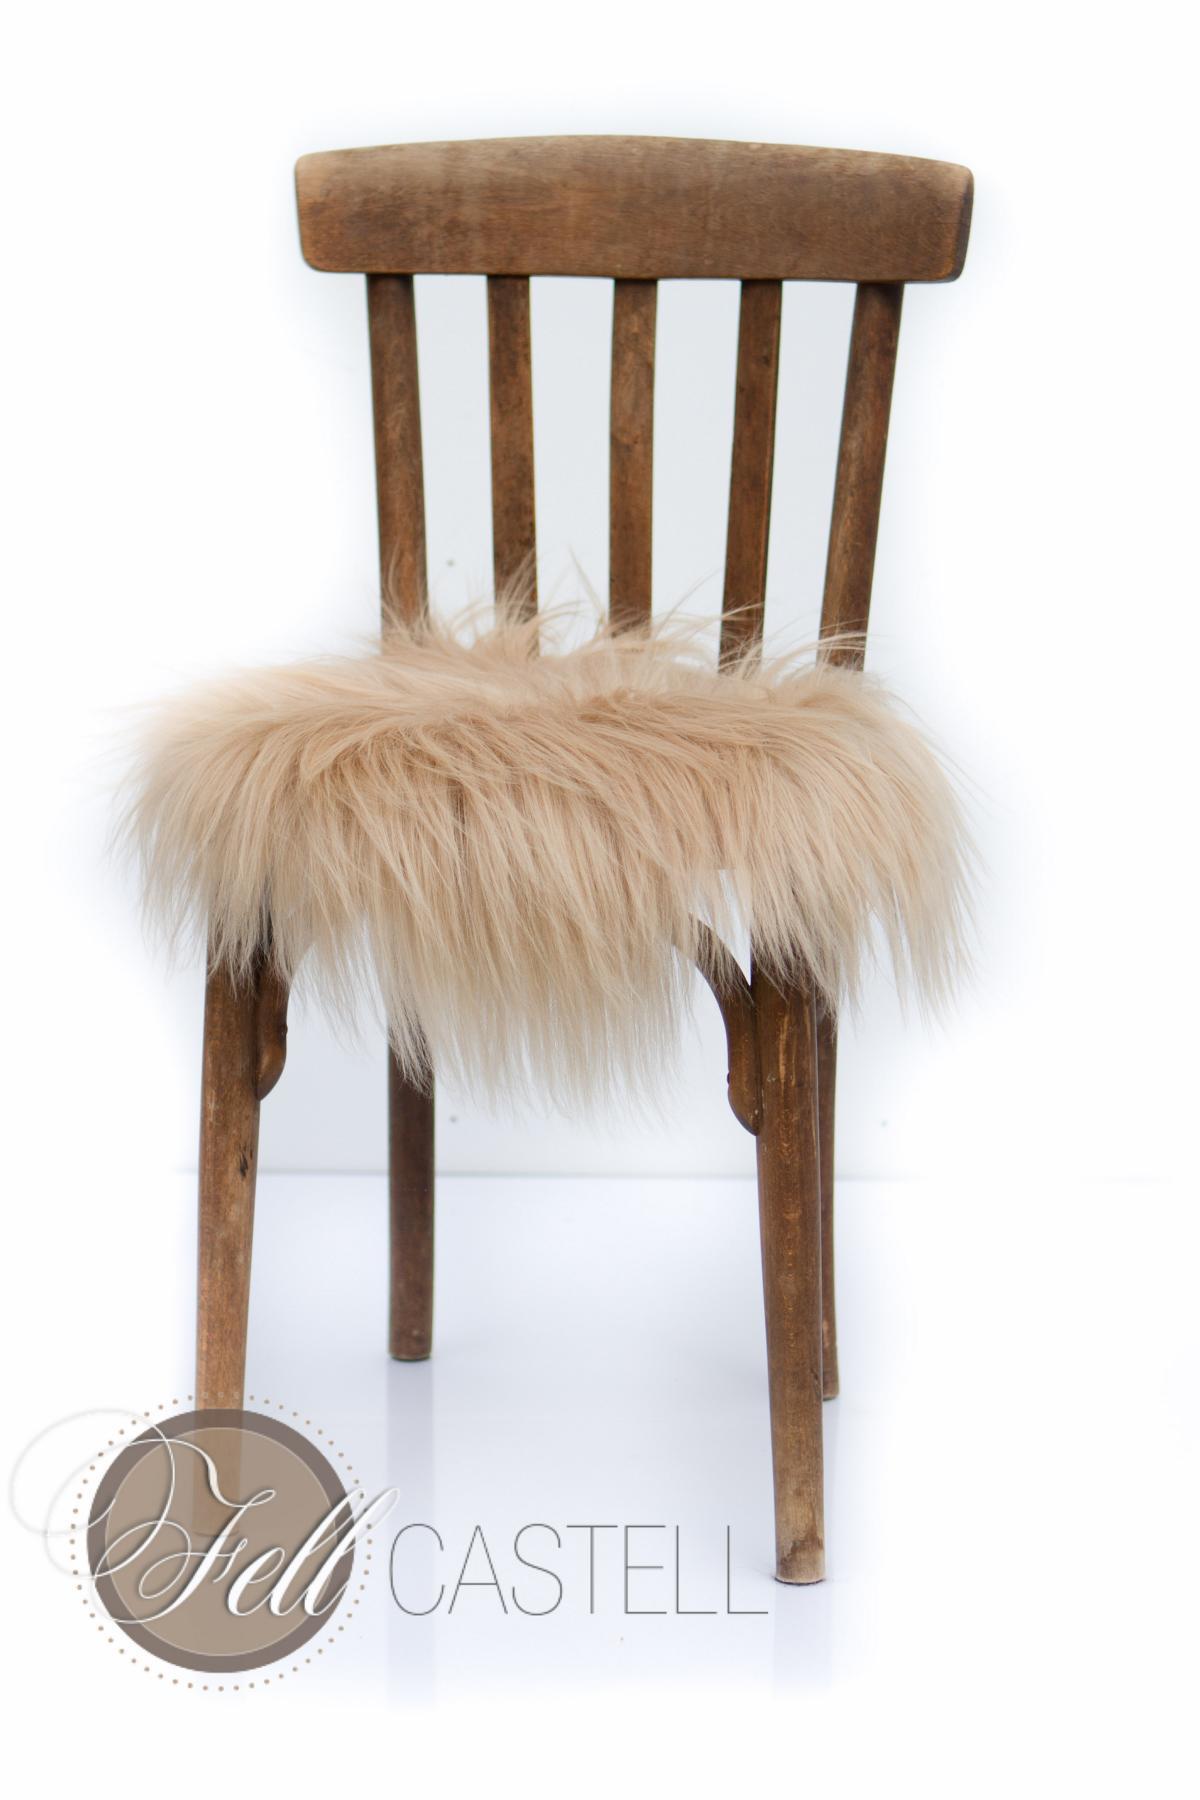 stuhlauflage aus island schaffell toffee 38 cm ungepolstert sitzauflage lammfell lammfell. Black Bedroom Furniture Sets. Home Design Ideas